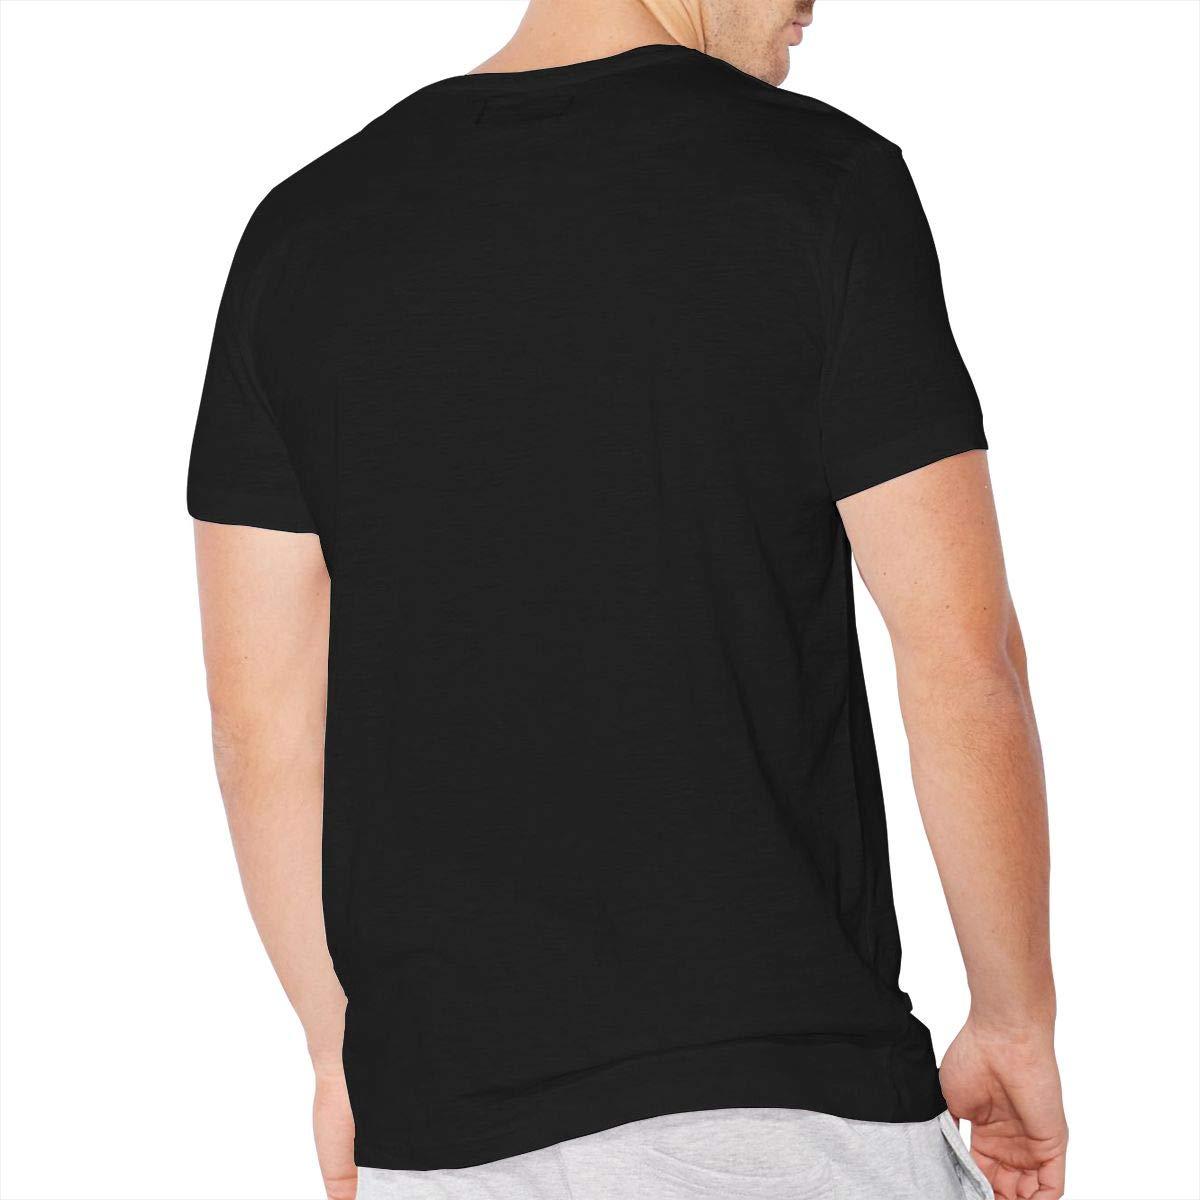 Mens Three Percenter 1776 Classic Breathable Short-Sleeve Crewneck Cotton T-Shirt Black